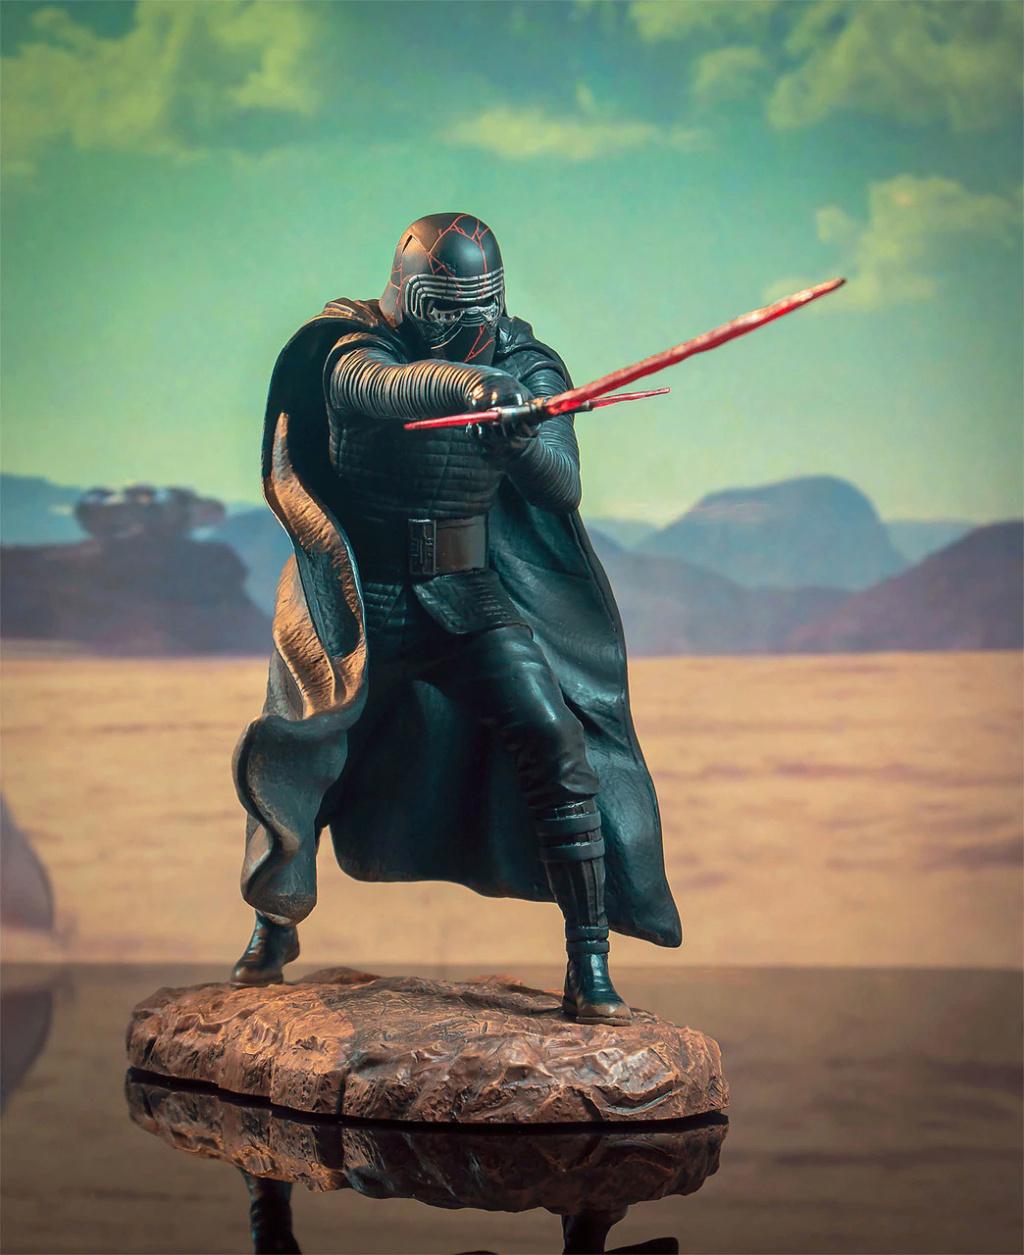 Kylo Ren Rise of Skywalker Premier Collection 1:7 Statue DST 02_lef10